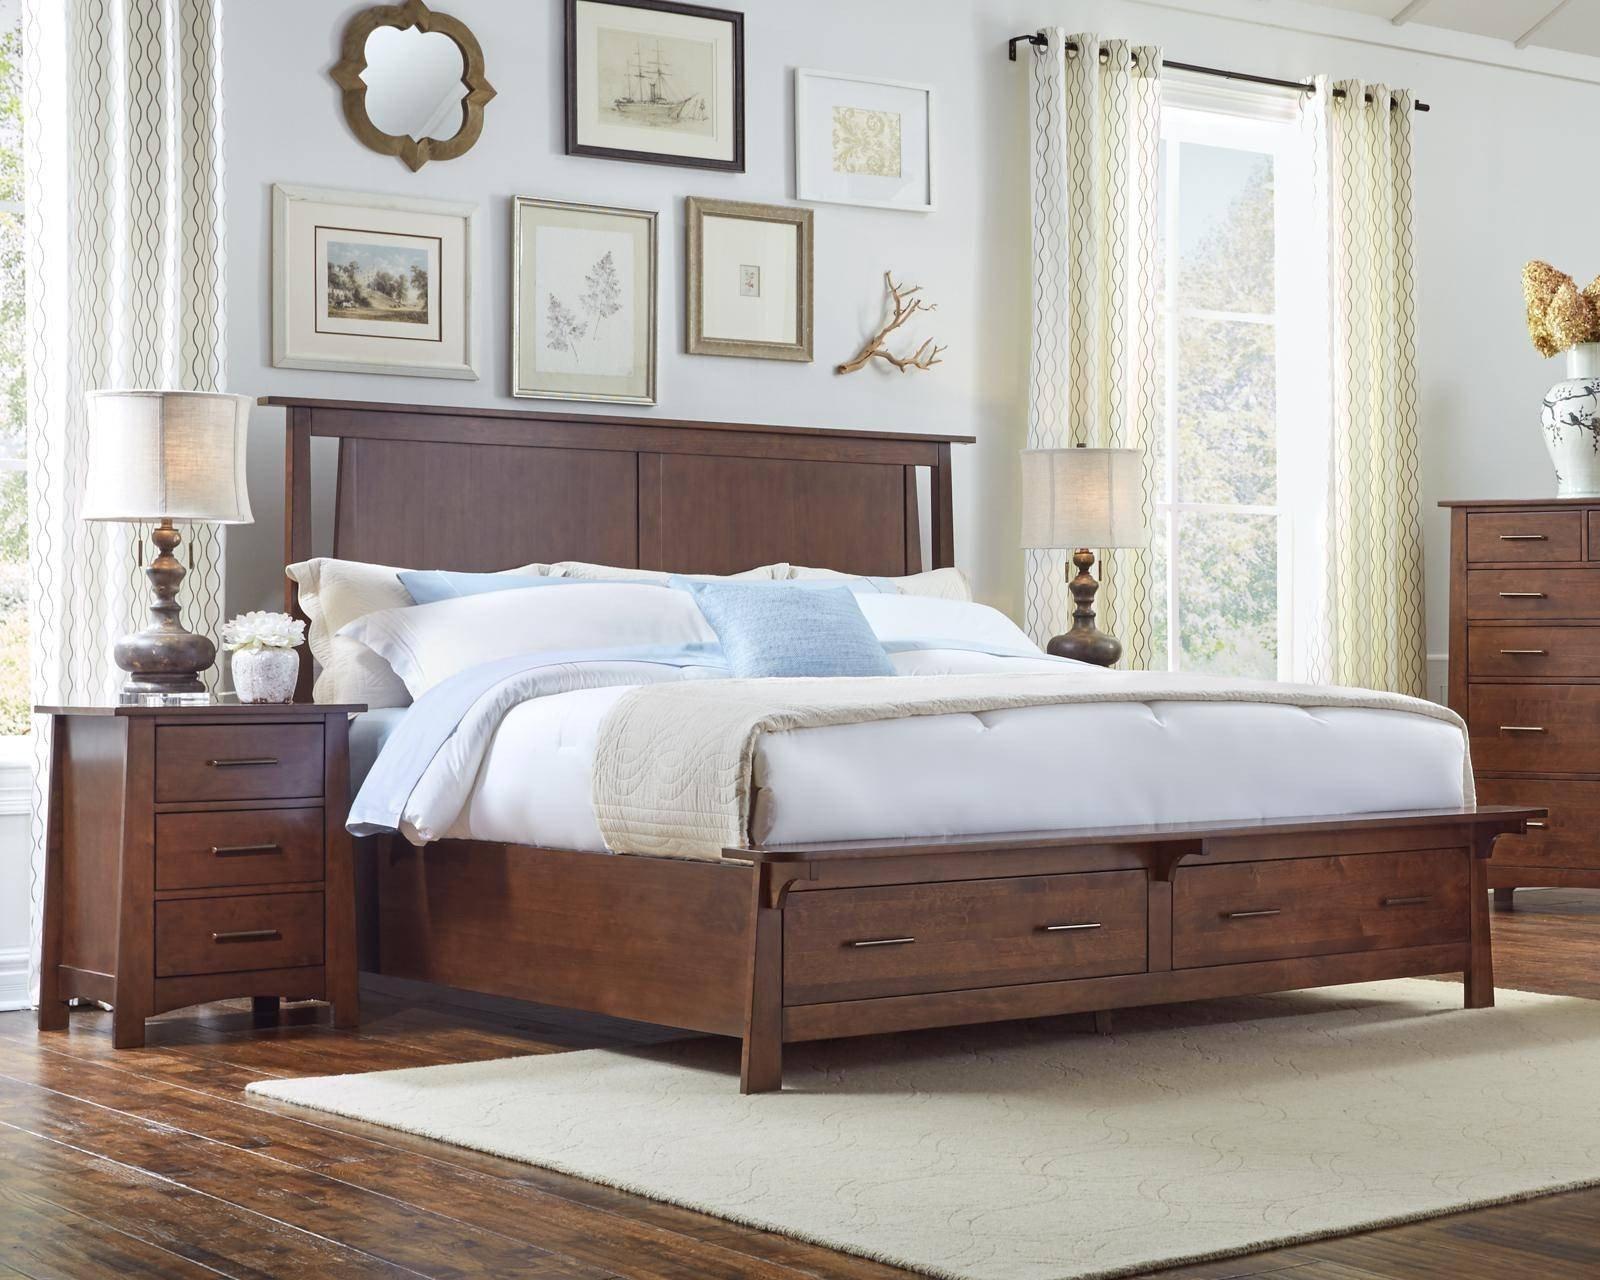 Bedroom Set with Storage Luxury Modern King Storage Bedroom Set 5pcs Sumatra Brown sodwb5131